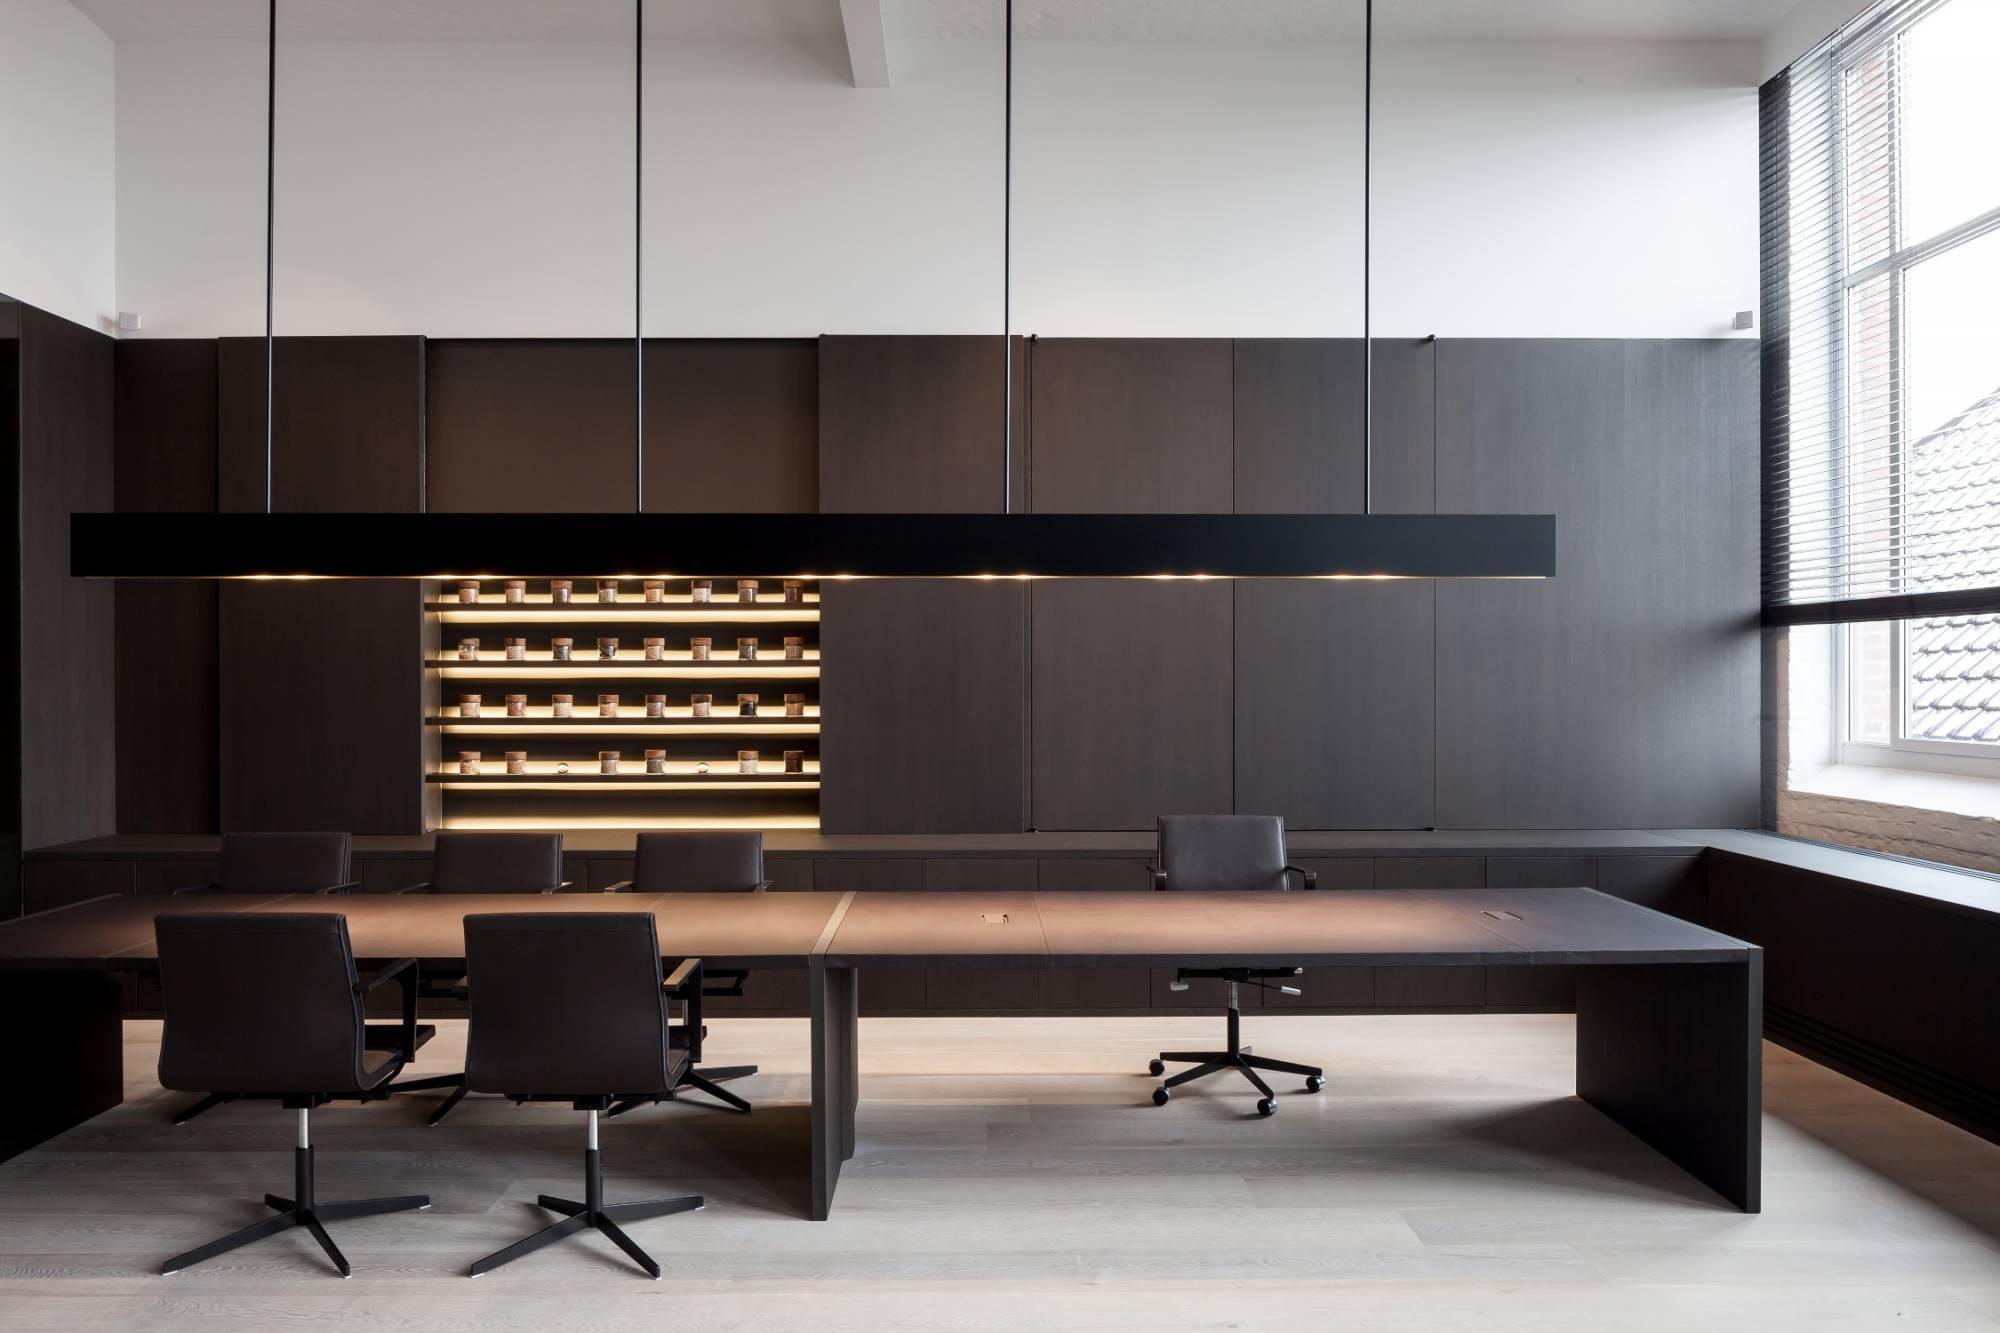 VVDA_H Offices_Thomas De Bruyne_4